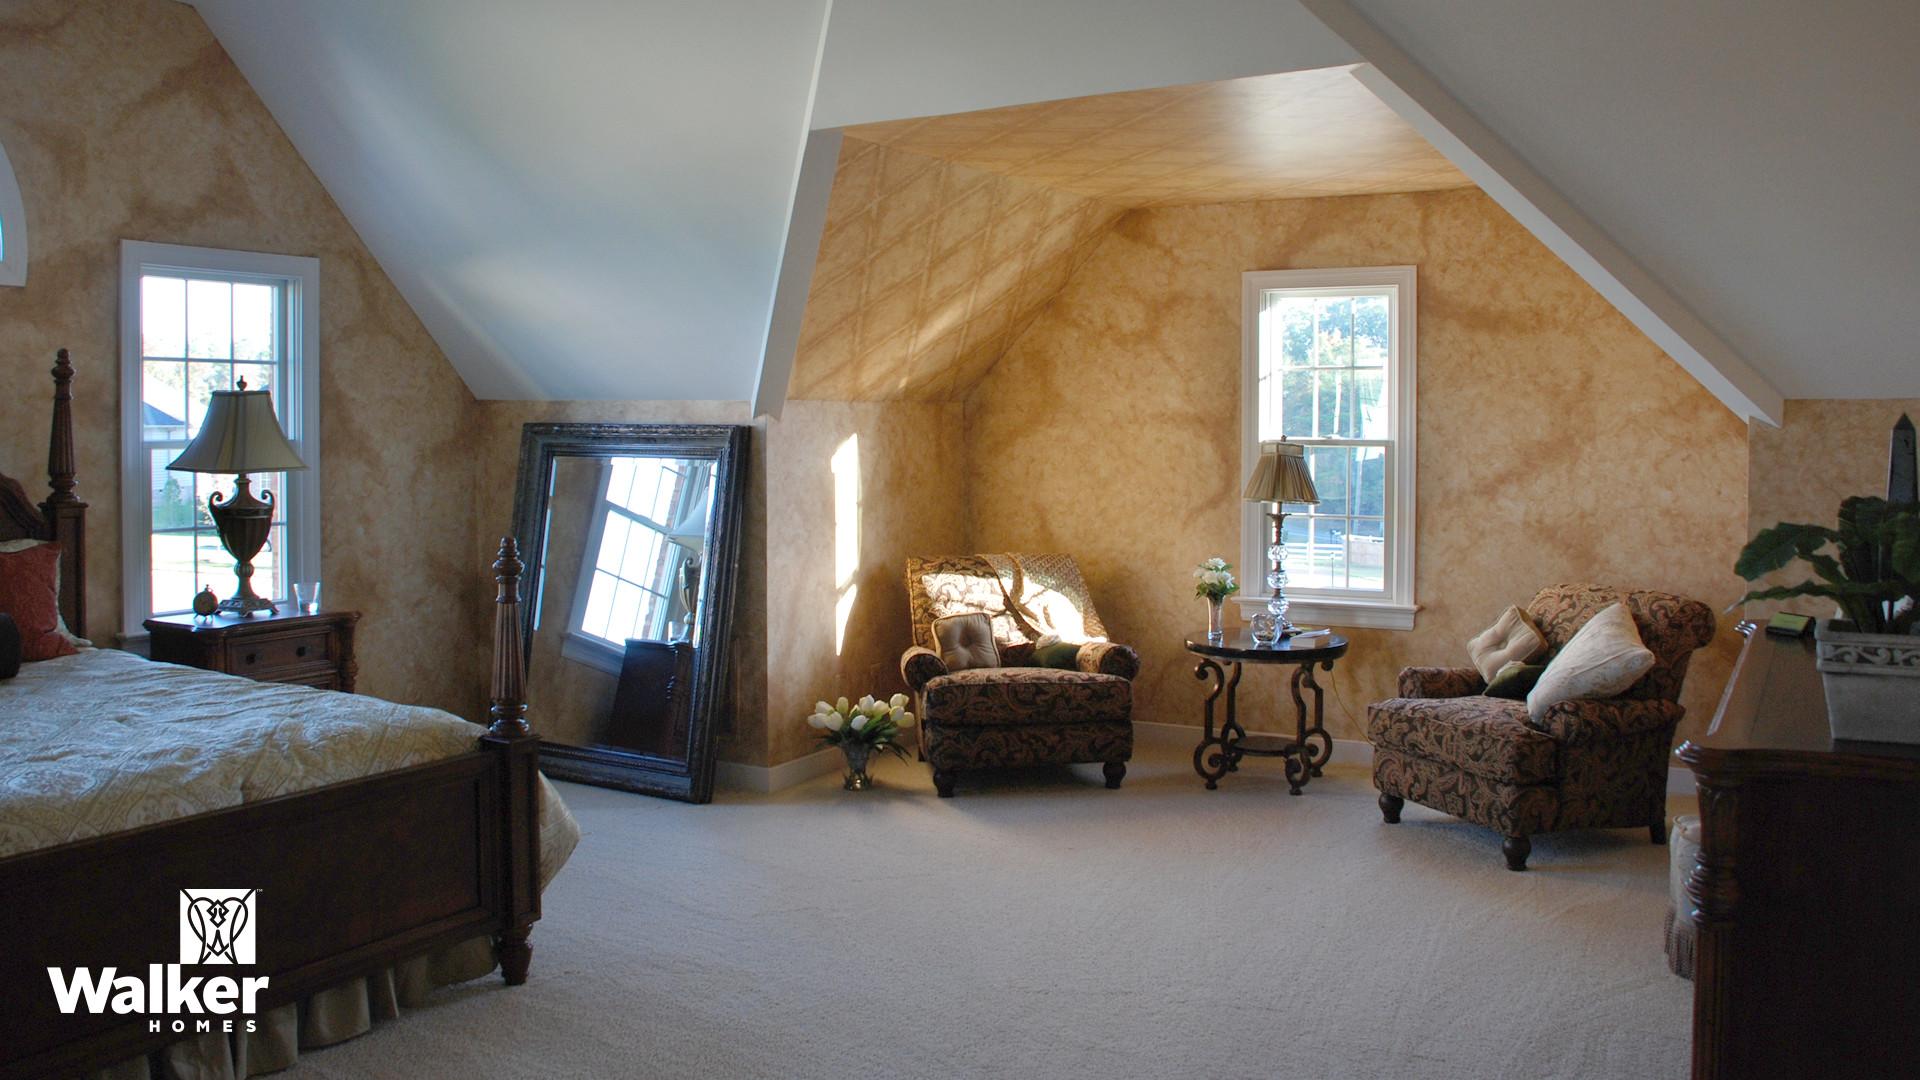 A Master Bedroom from a custom home design by Walker Homes in Glen Allen, Virginia